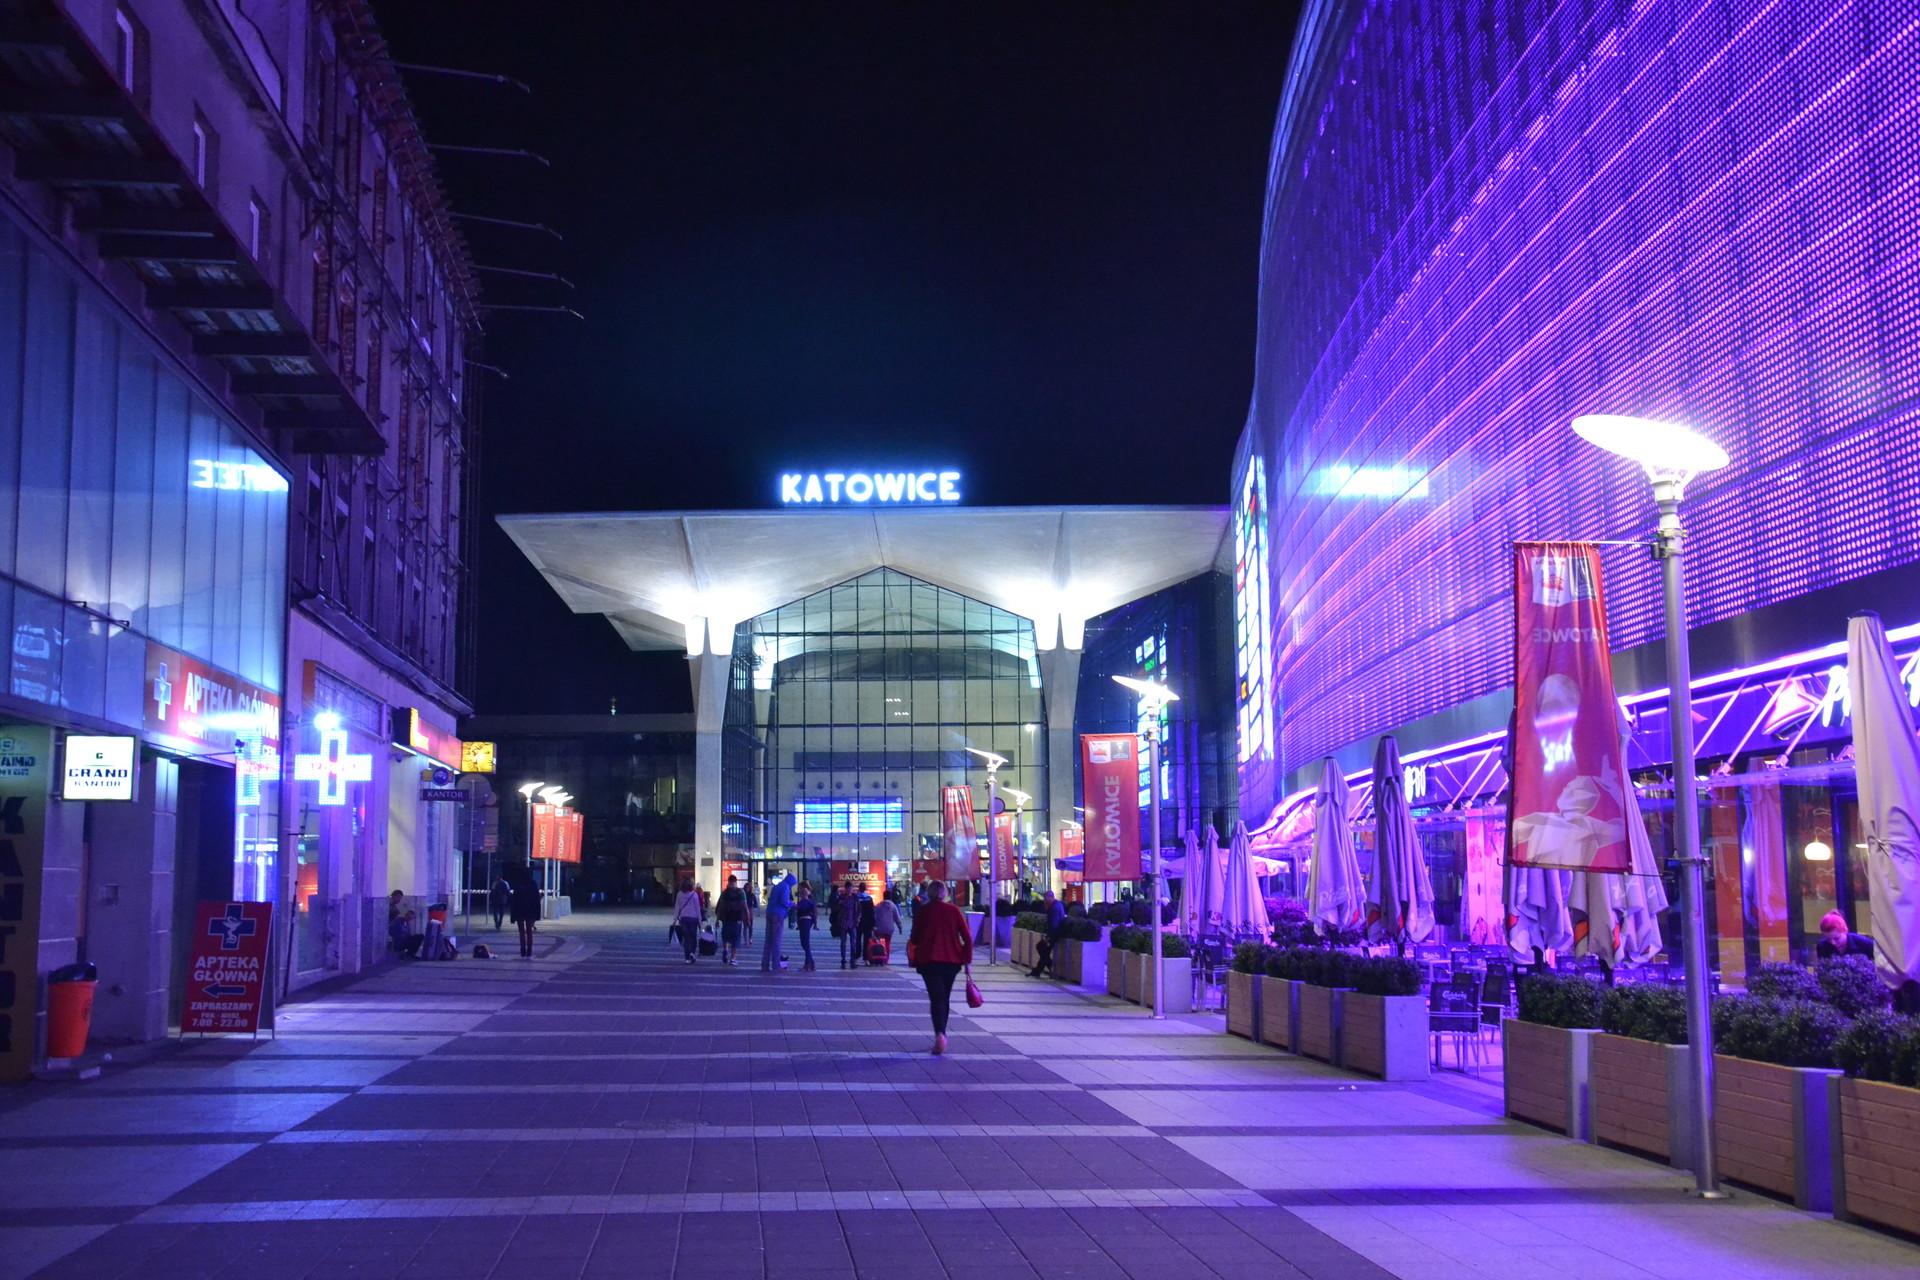 Esperienza a Katowice, Polonia di Natalia